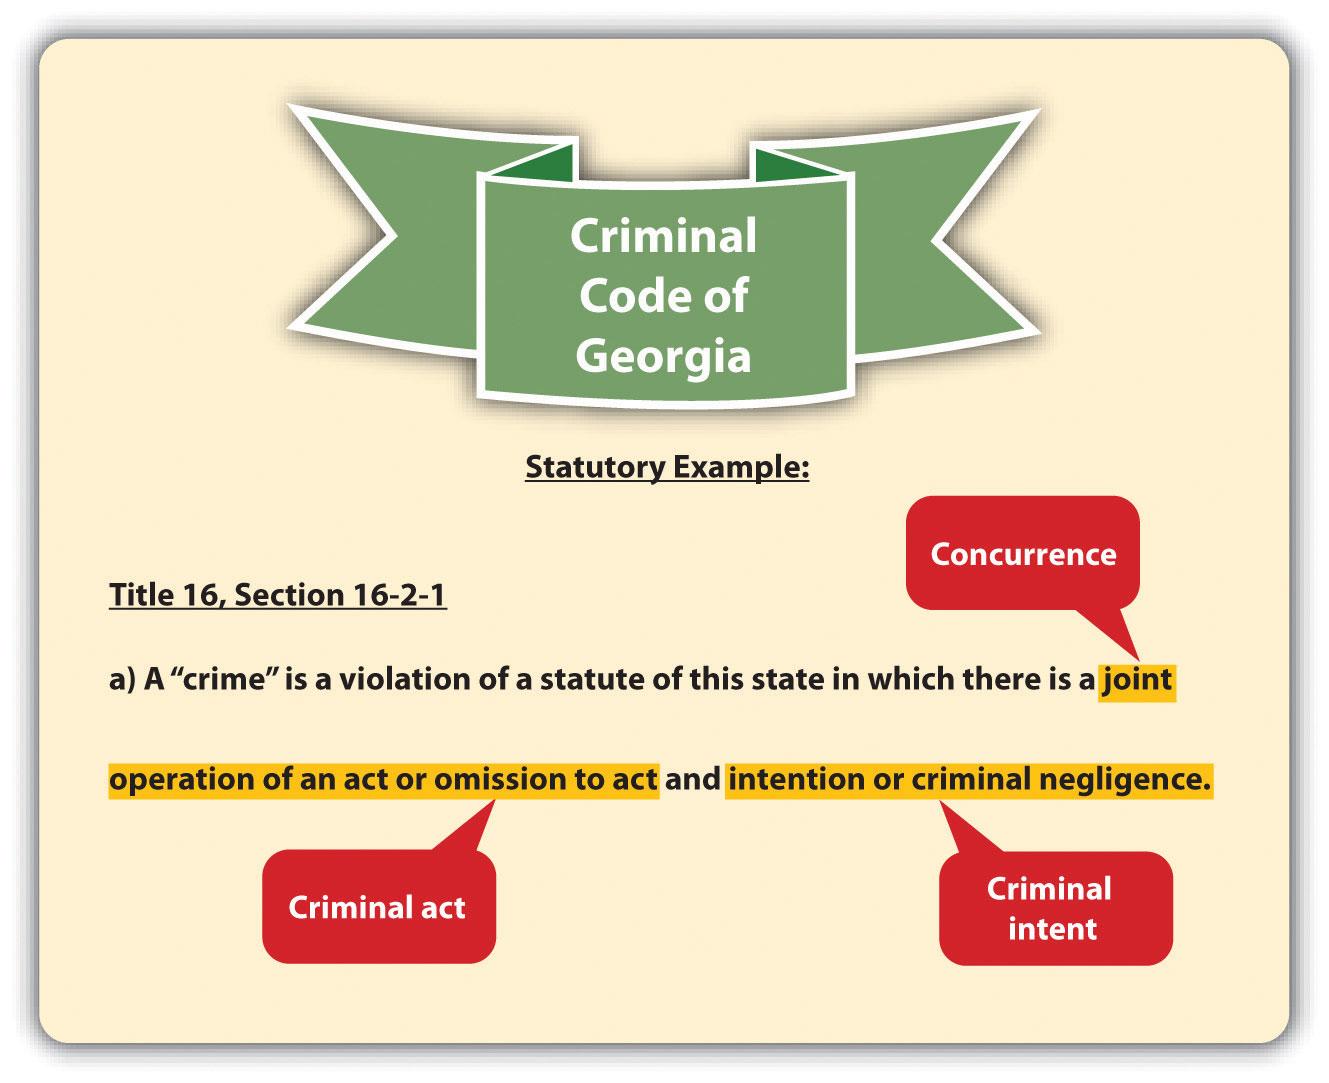 Criminal Code of Georgia